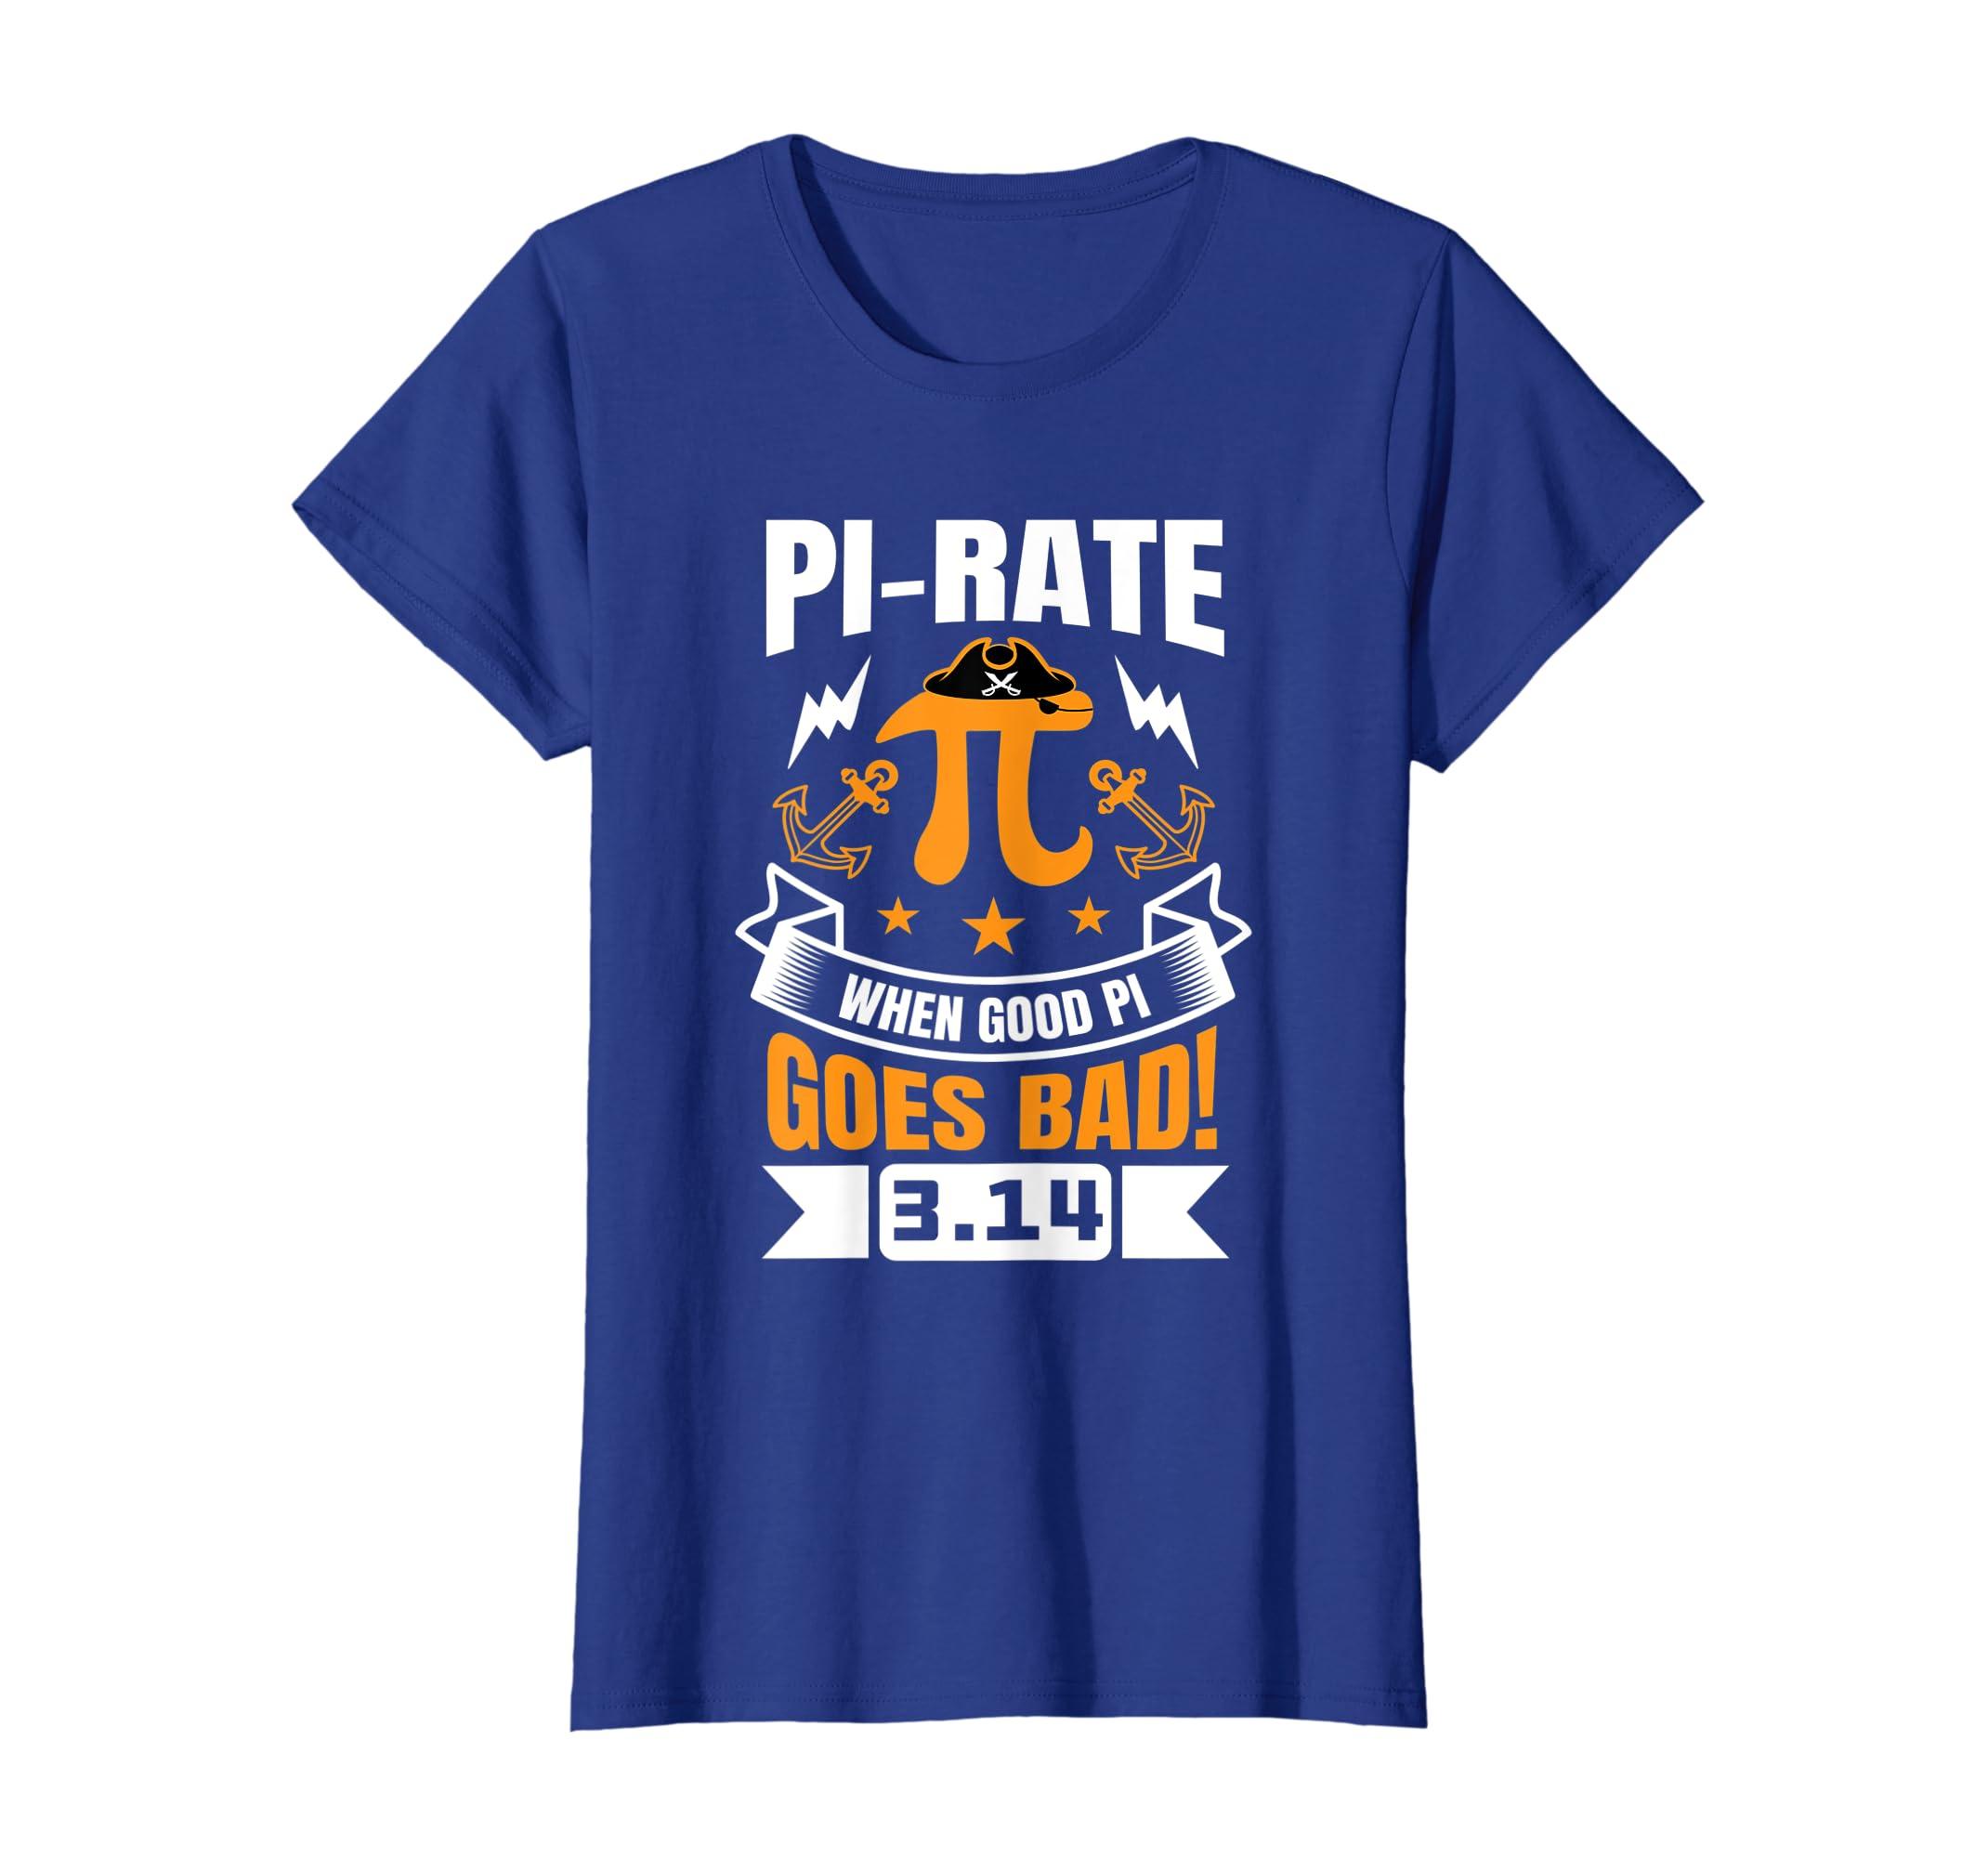 ad5de0c6 Amazon.com: Funny Pi Day T-Shirt Pirate Love Geek Nerd Math teacher Tee:  Clothing